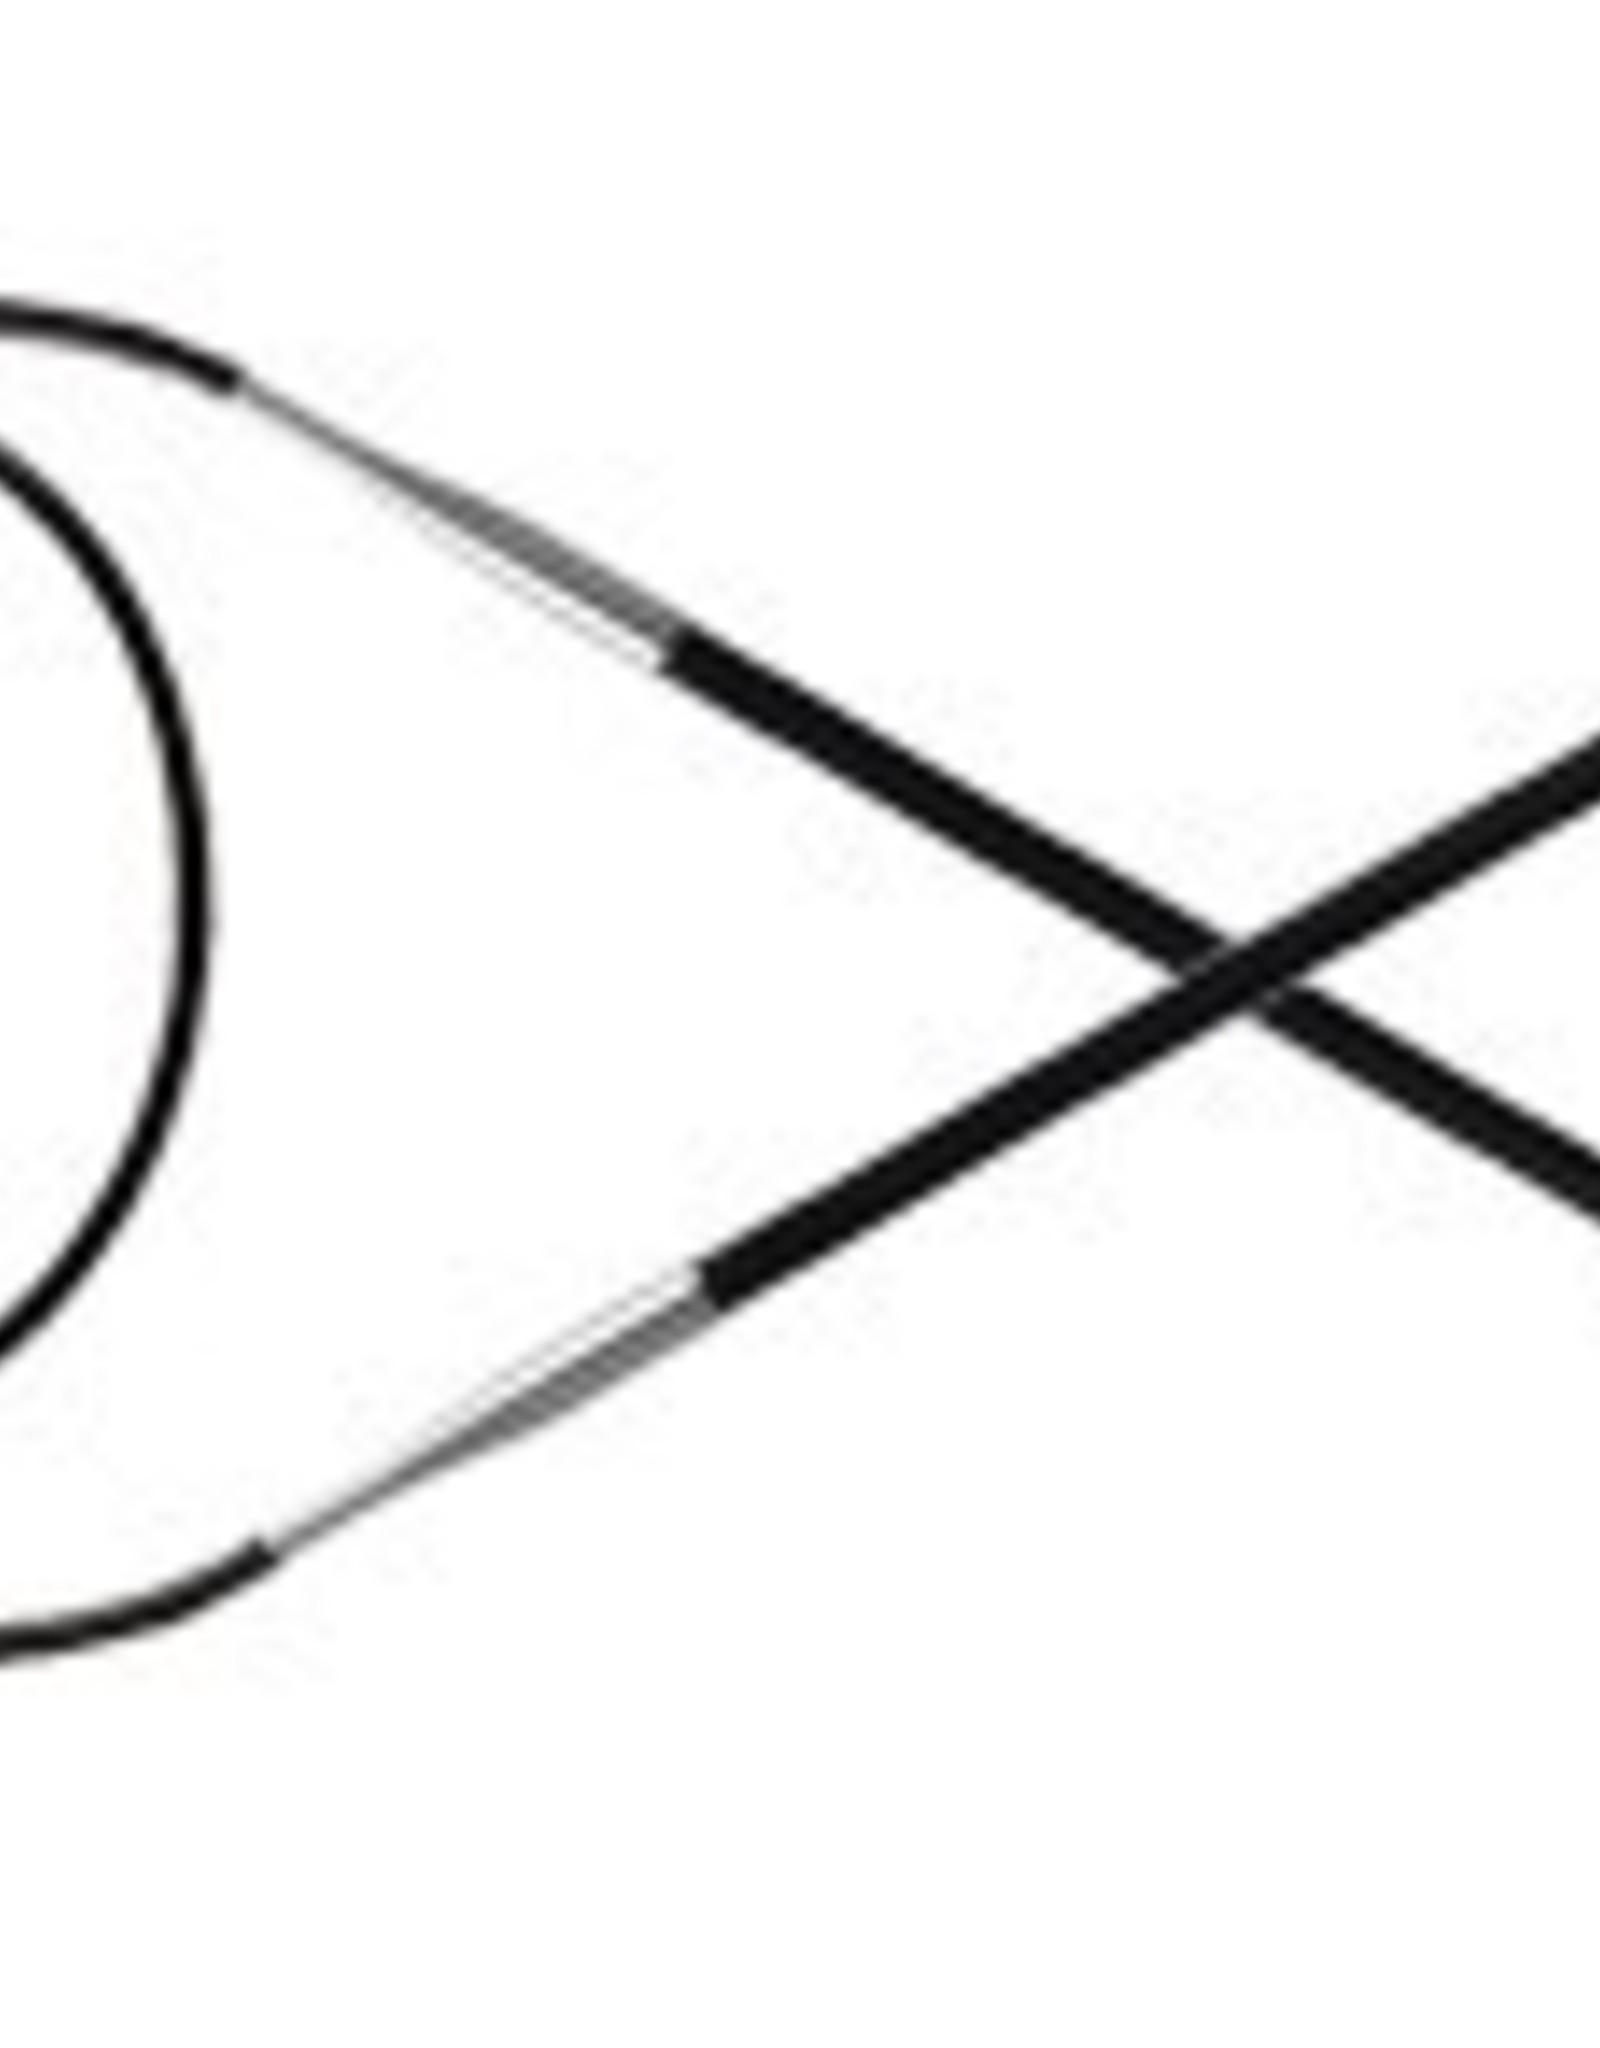 Knitter's Pride 1.5 Karbonz Circular 24